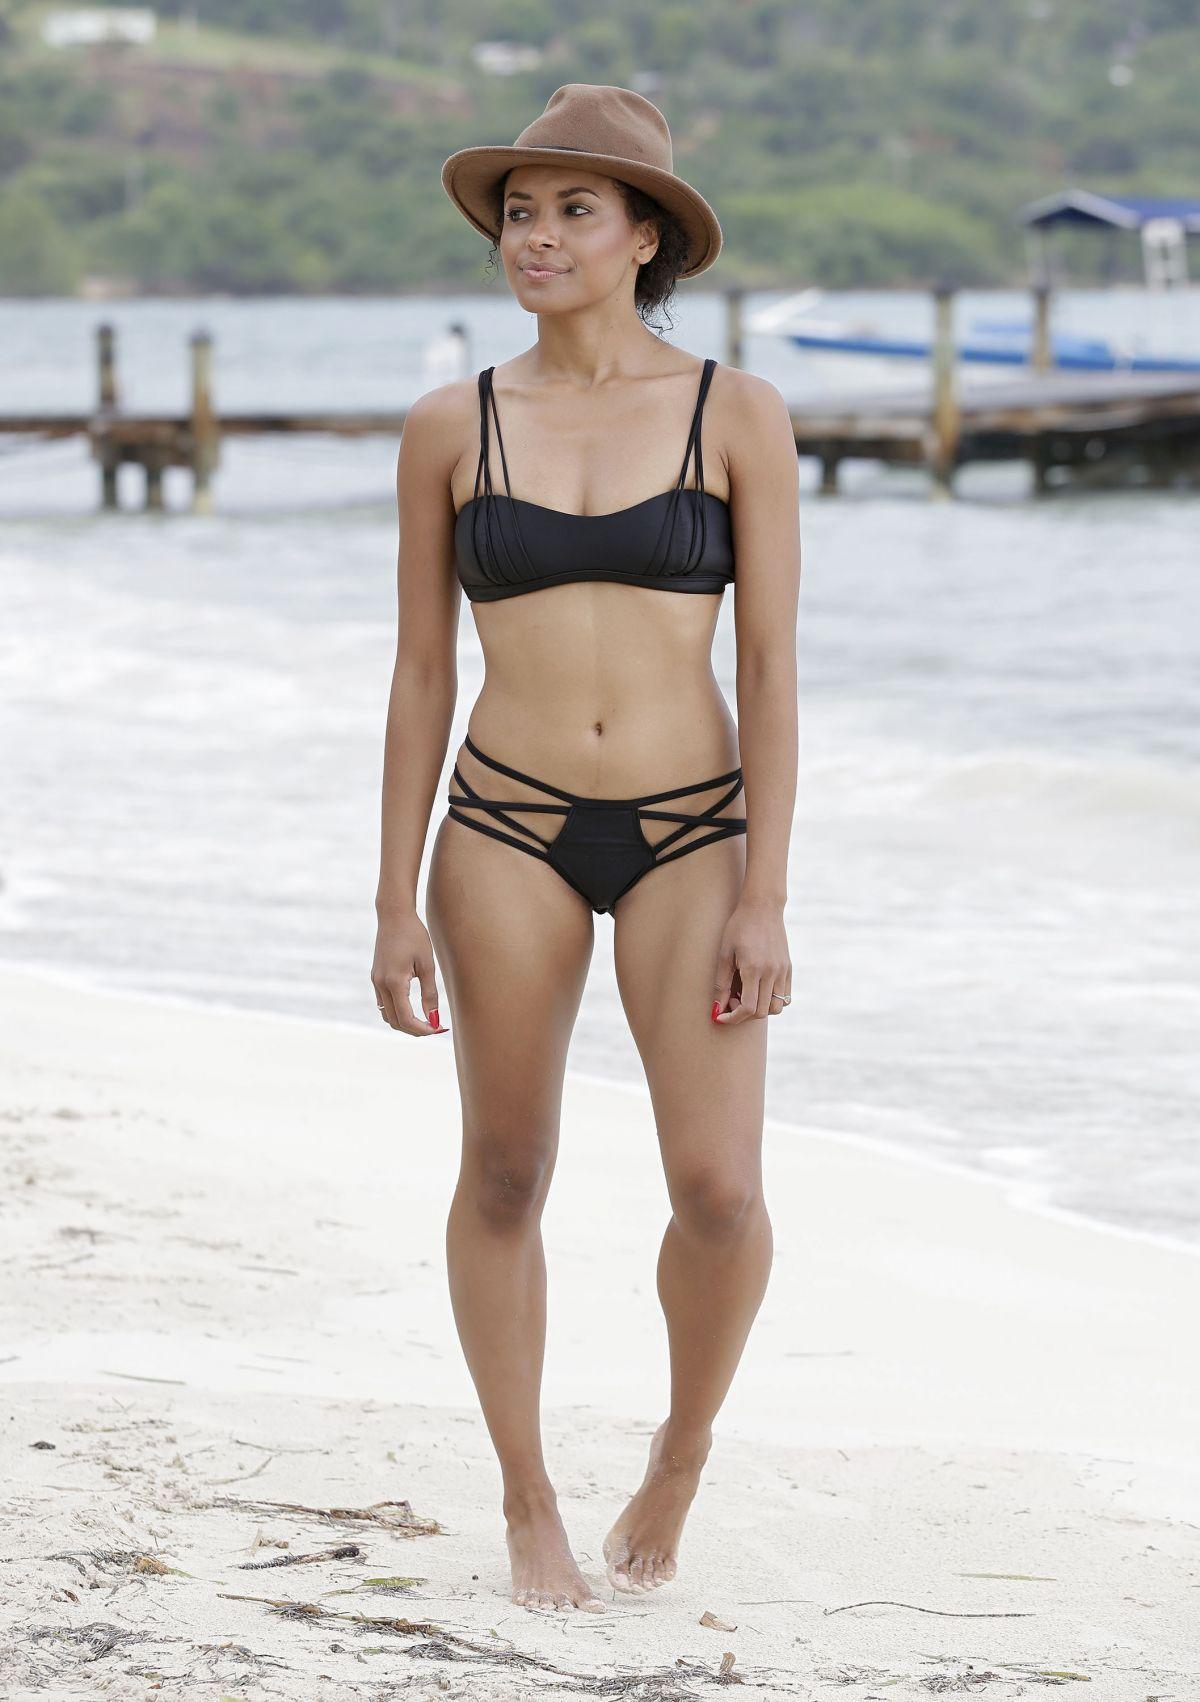 butt Bikini Heather Watson naked photo 2017